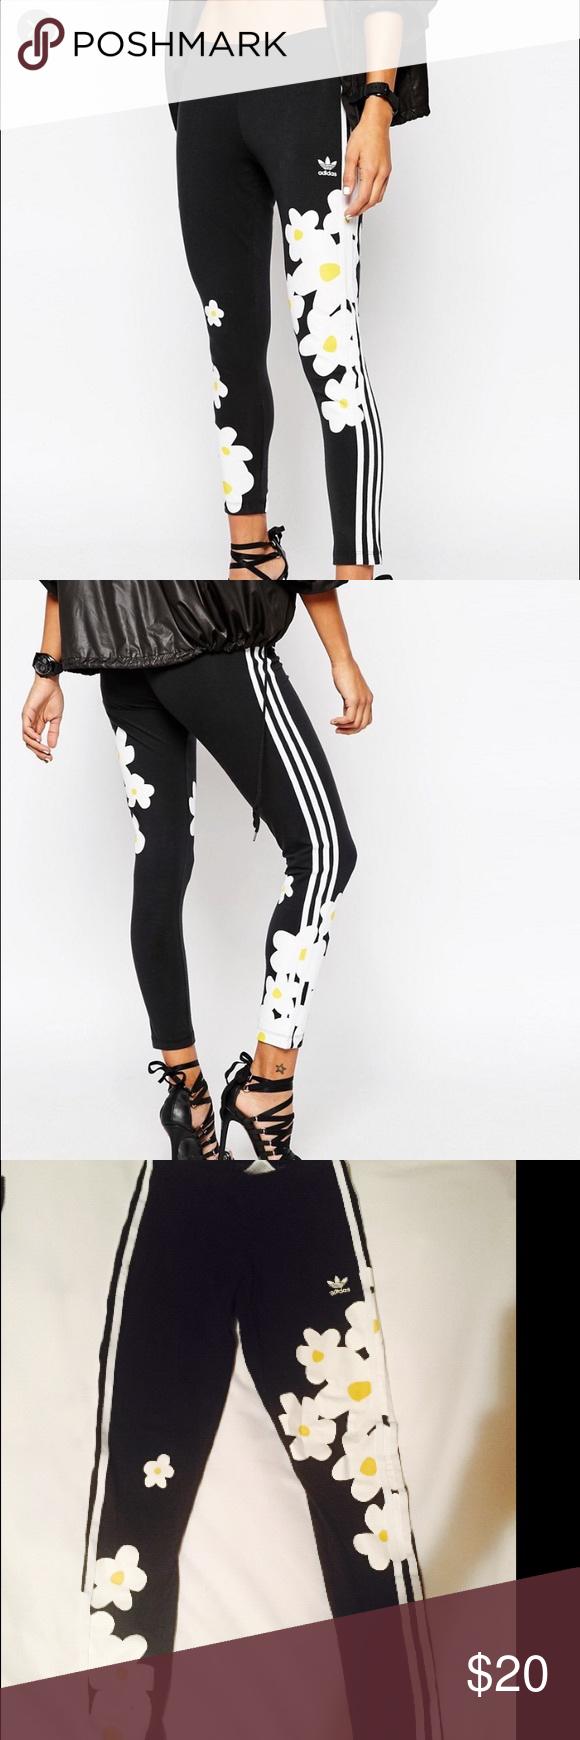 dd0f4bc5054c ADIDAS originals Pharrell Williams leggings XS Women s Black Originals  Pharrell Williams 3 Stripe Leggings With Daisy Floral Print size XS worn 2  times ...